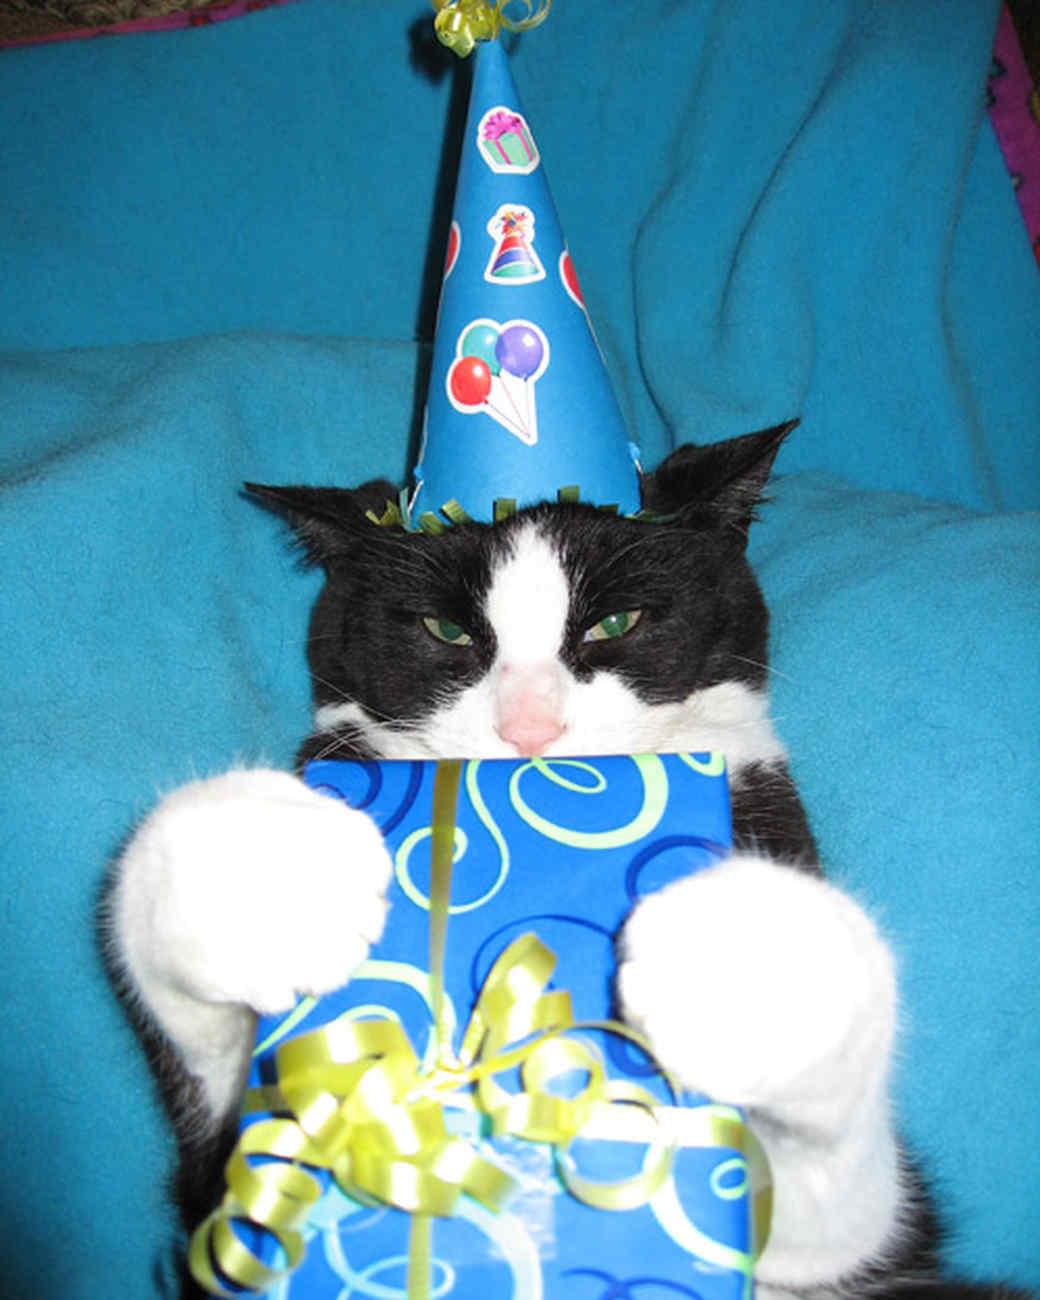 party_animals_photo_contest_84413.jpg